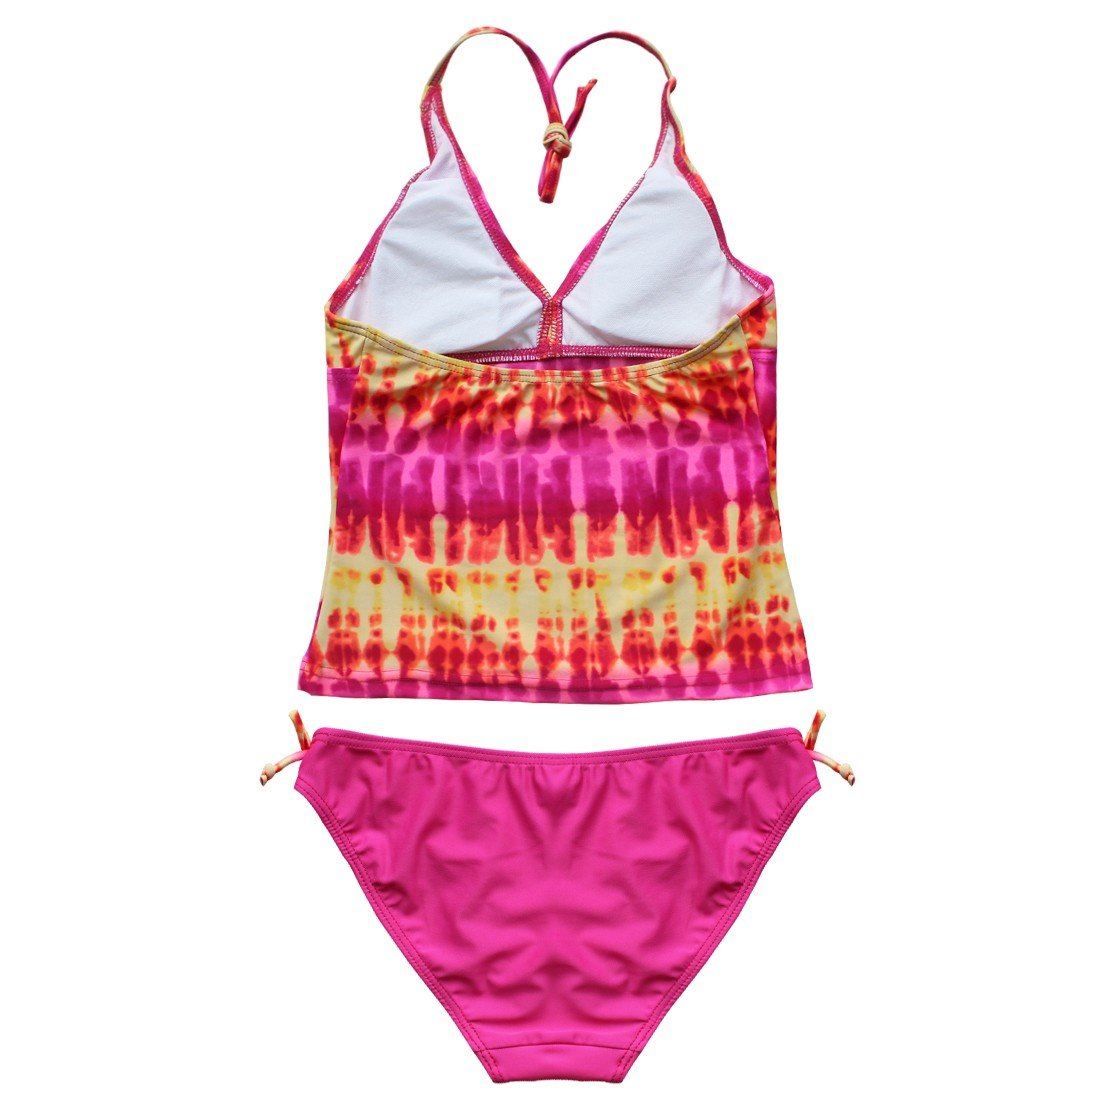 iEFiEL Big Girls Fashion Tie-Dye Halter Tankini Set Beach Holiday Swimwear Bathing Suit